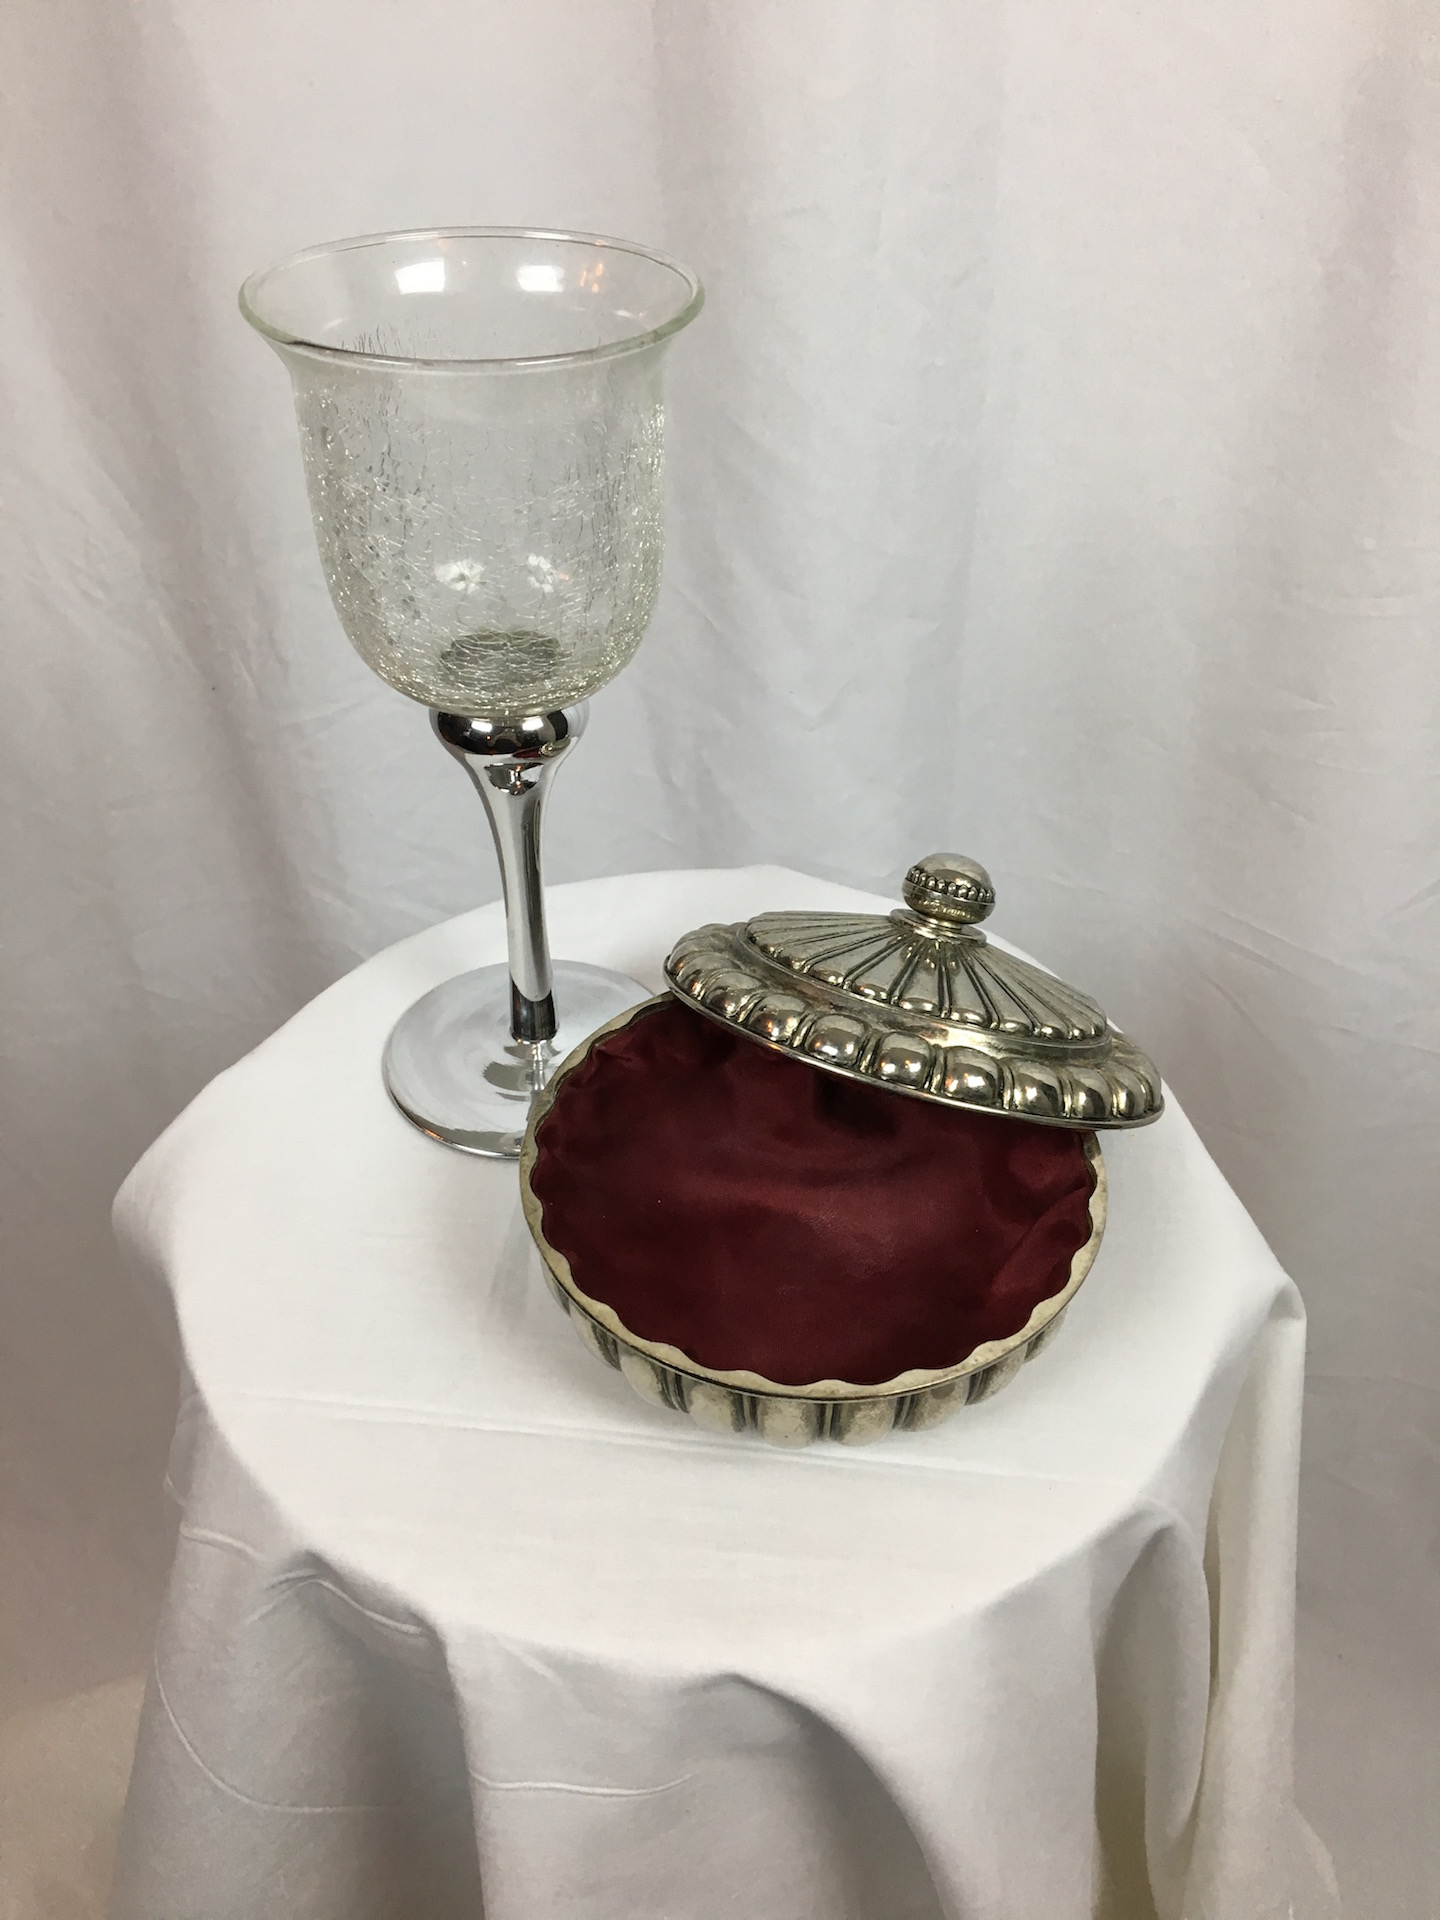 Turkish Delight Jar and Goblet